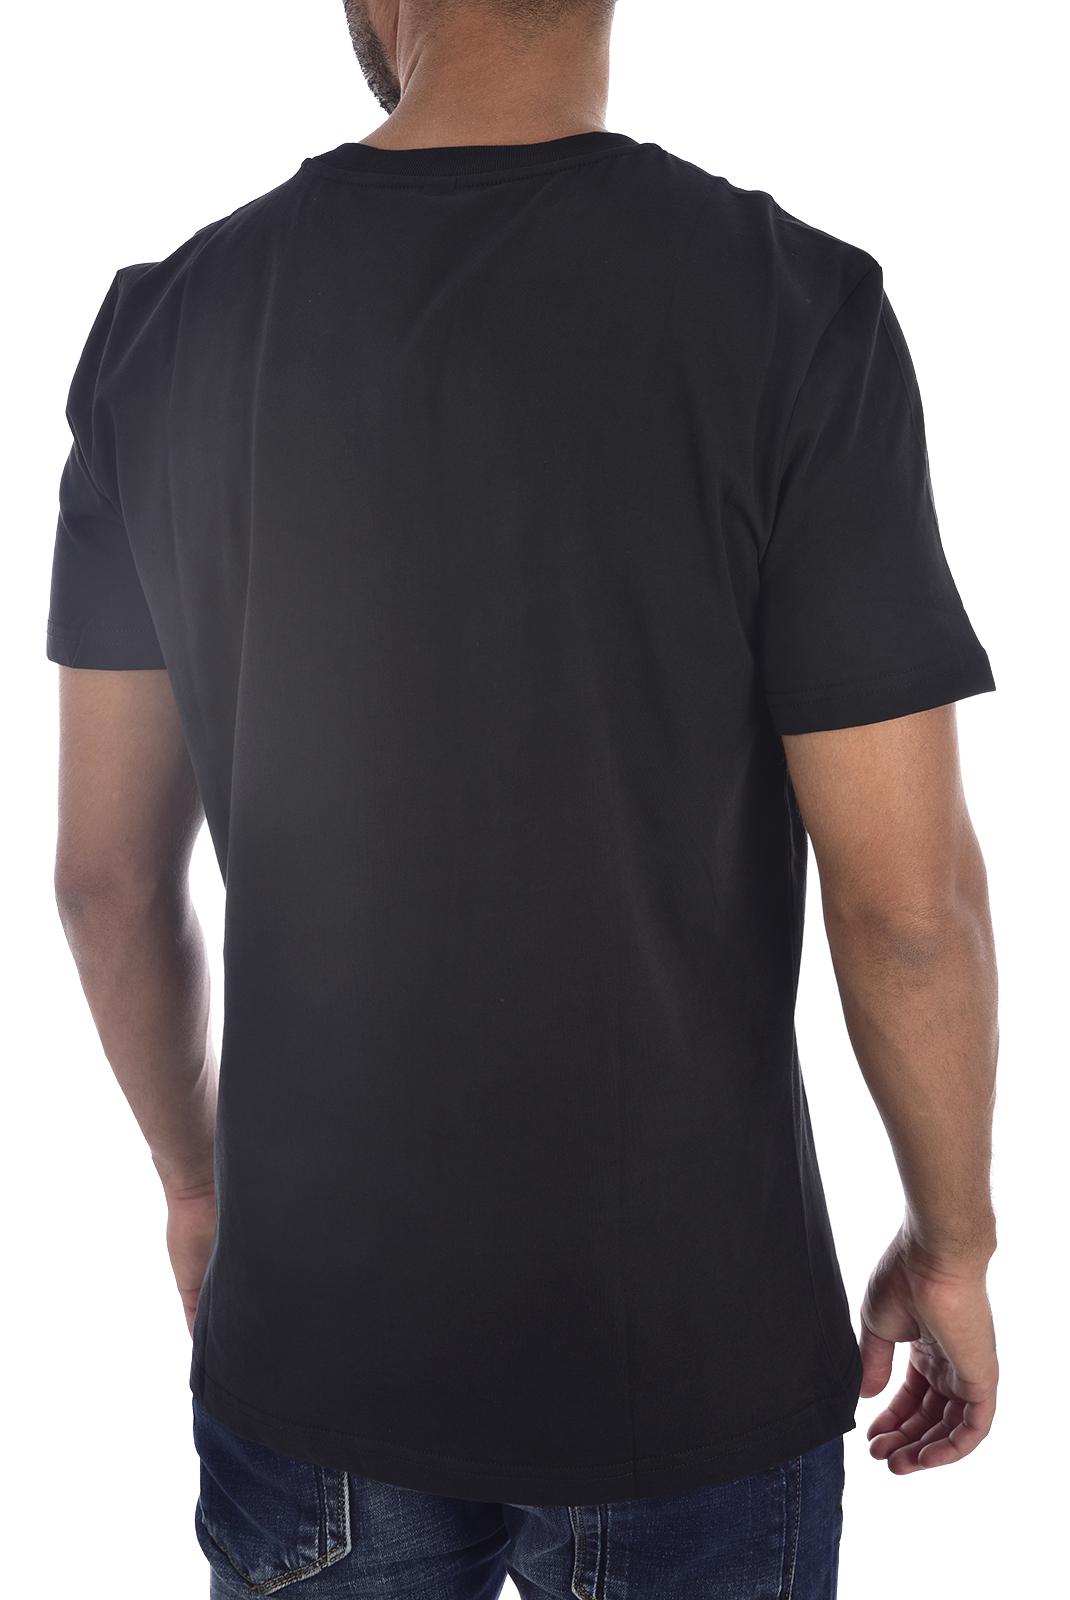 Tee-shirts  Moschino 3A1911 BLACK